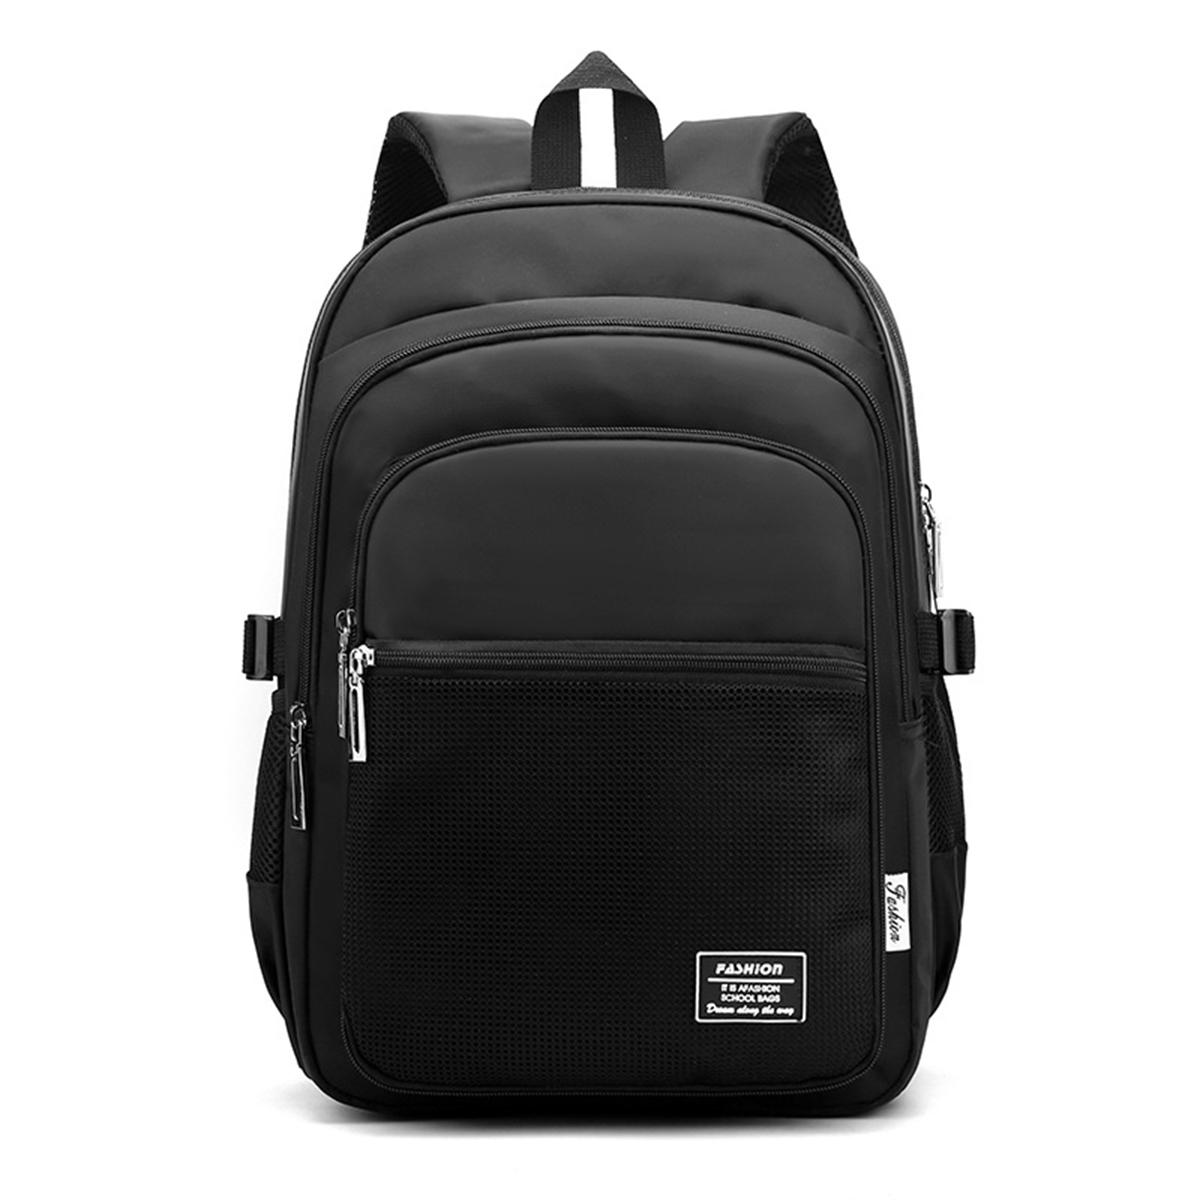 Kids Nylon School Bags Large Capacity School Student Backpack Multifunctional Shoulder Backpack Stationery